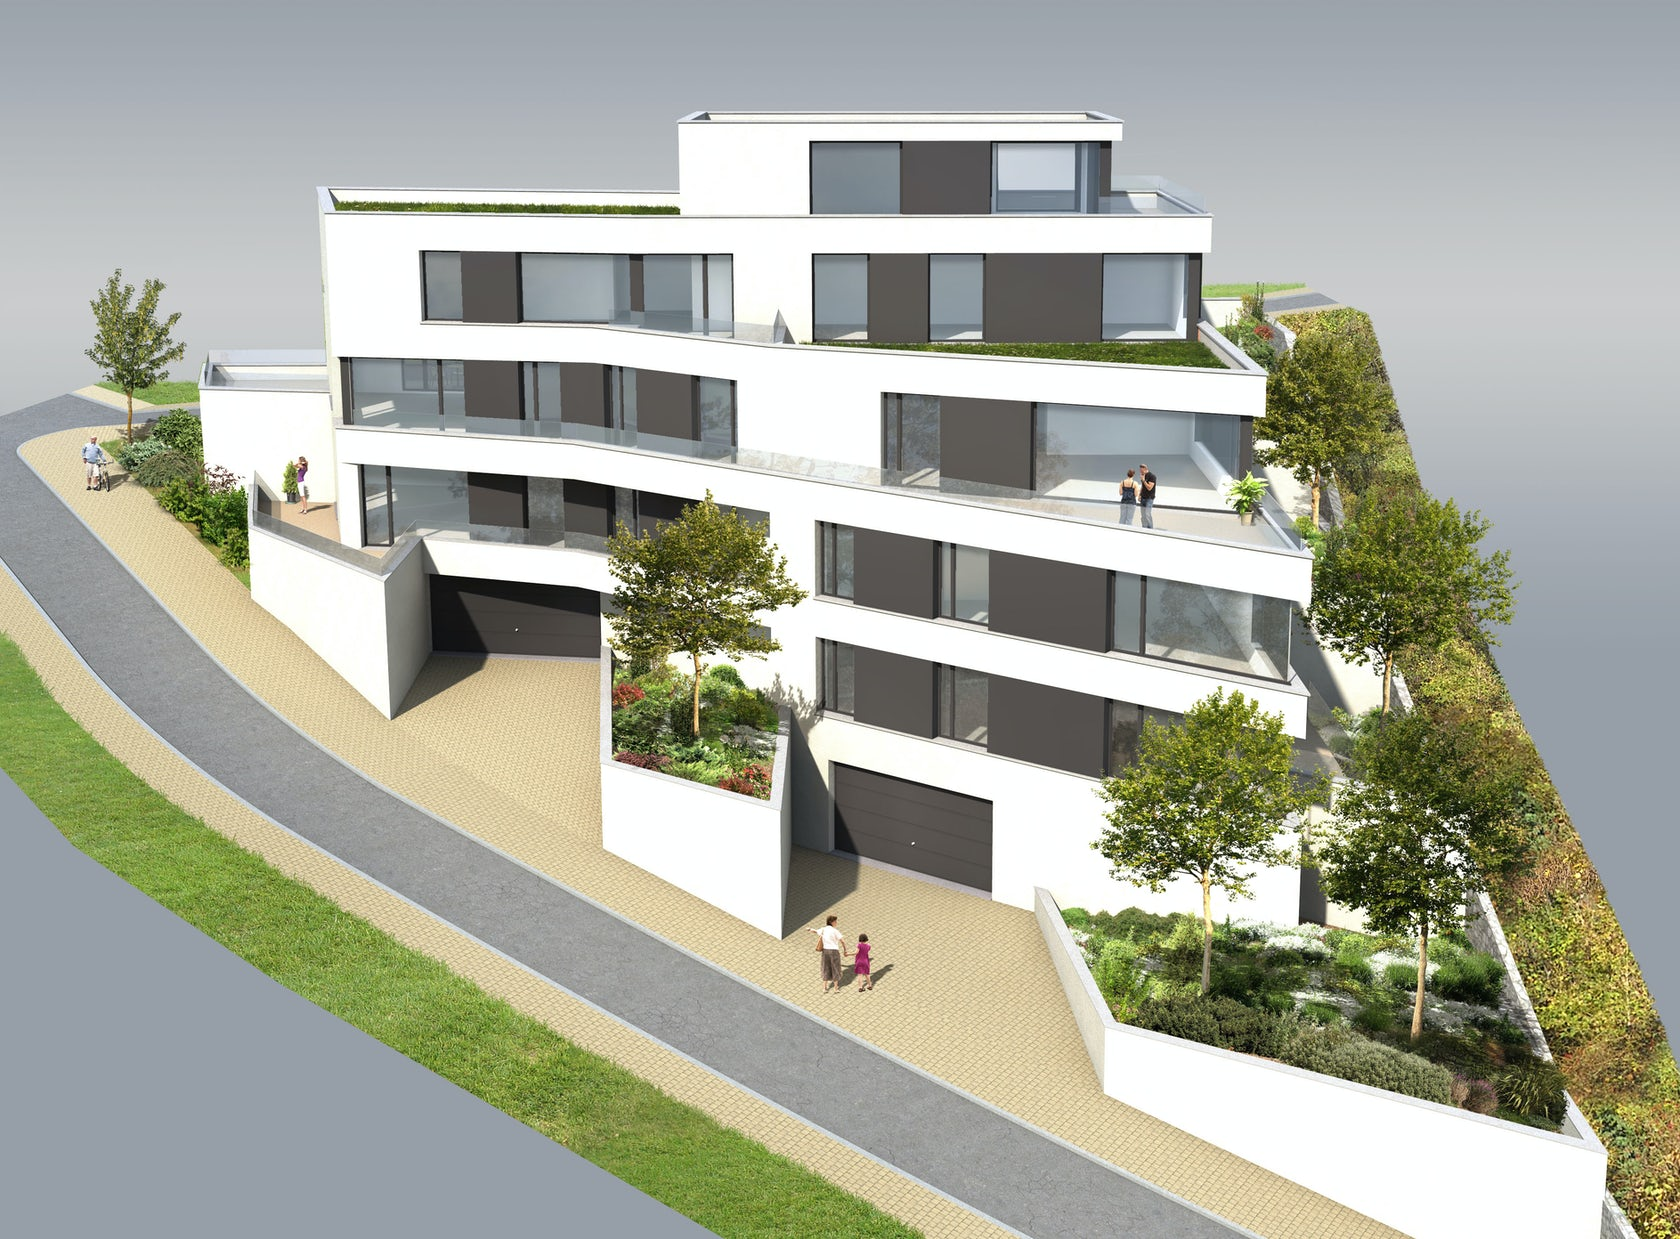 baul cken 2010 luxembourg 2 architizer. Black Bedroom Furniture Sets. Home Design Ideas